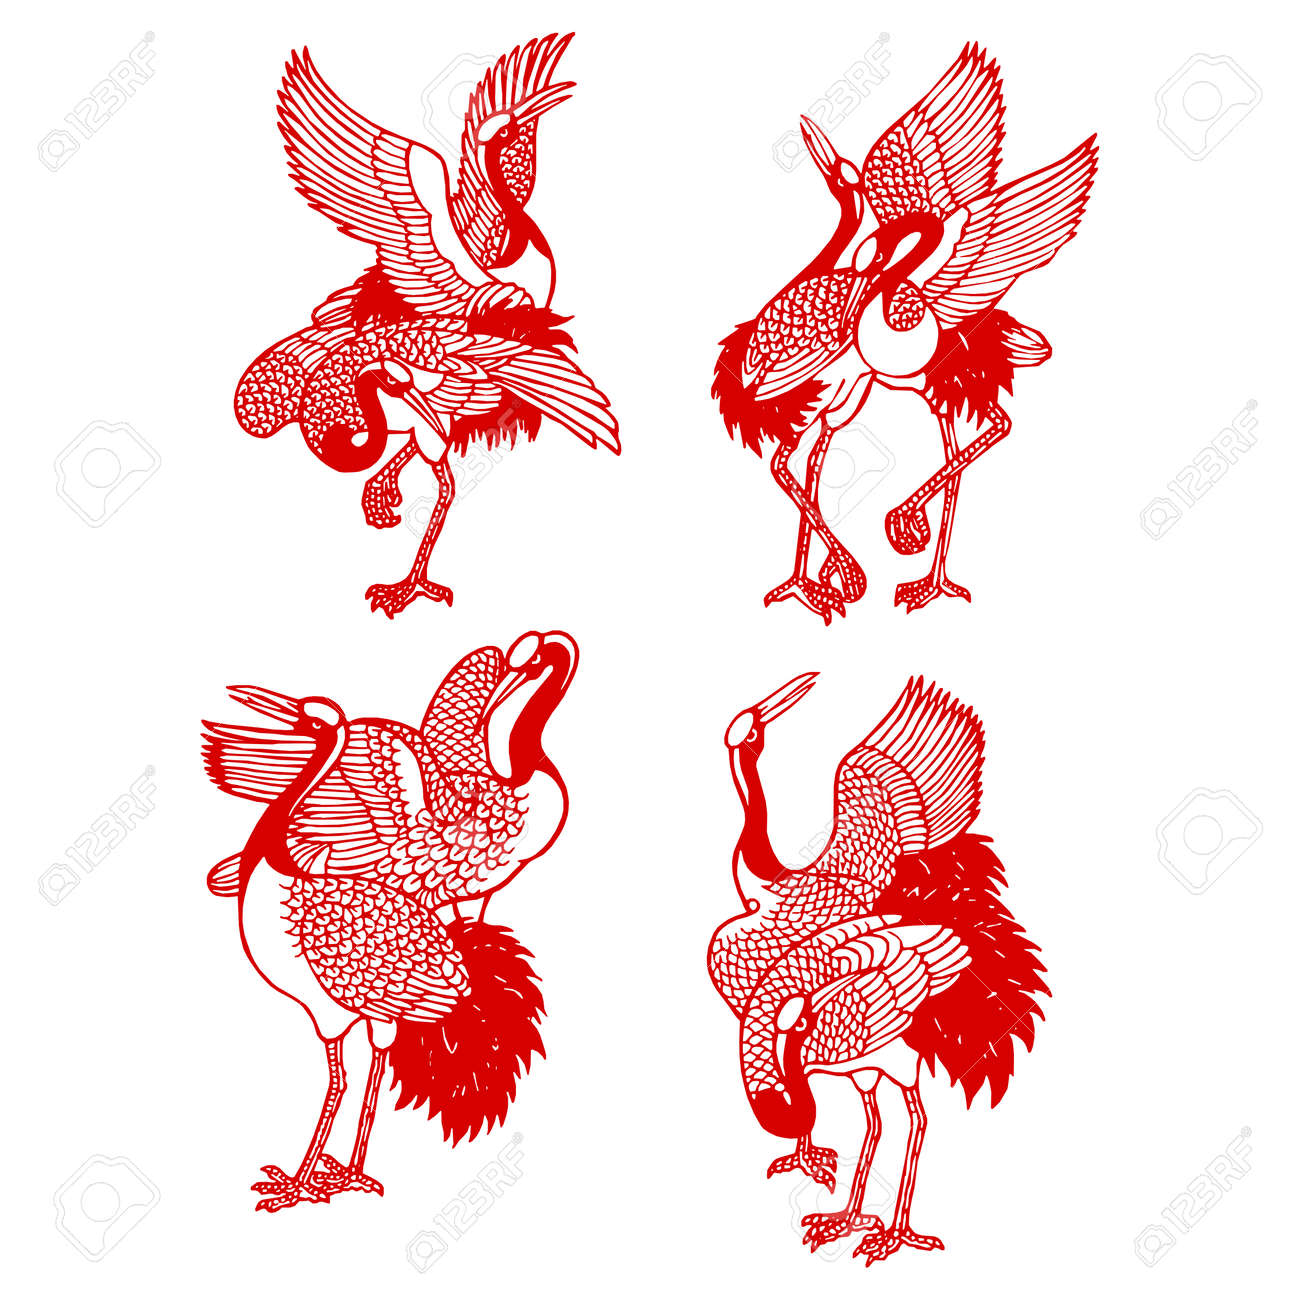 2,449 Heron Stock Illustrations, Cliparts And Royalty Free Heron Vectors